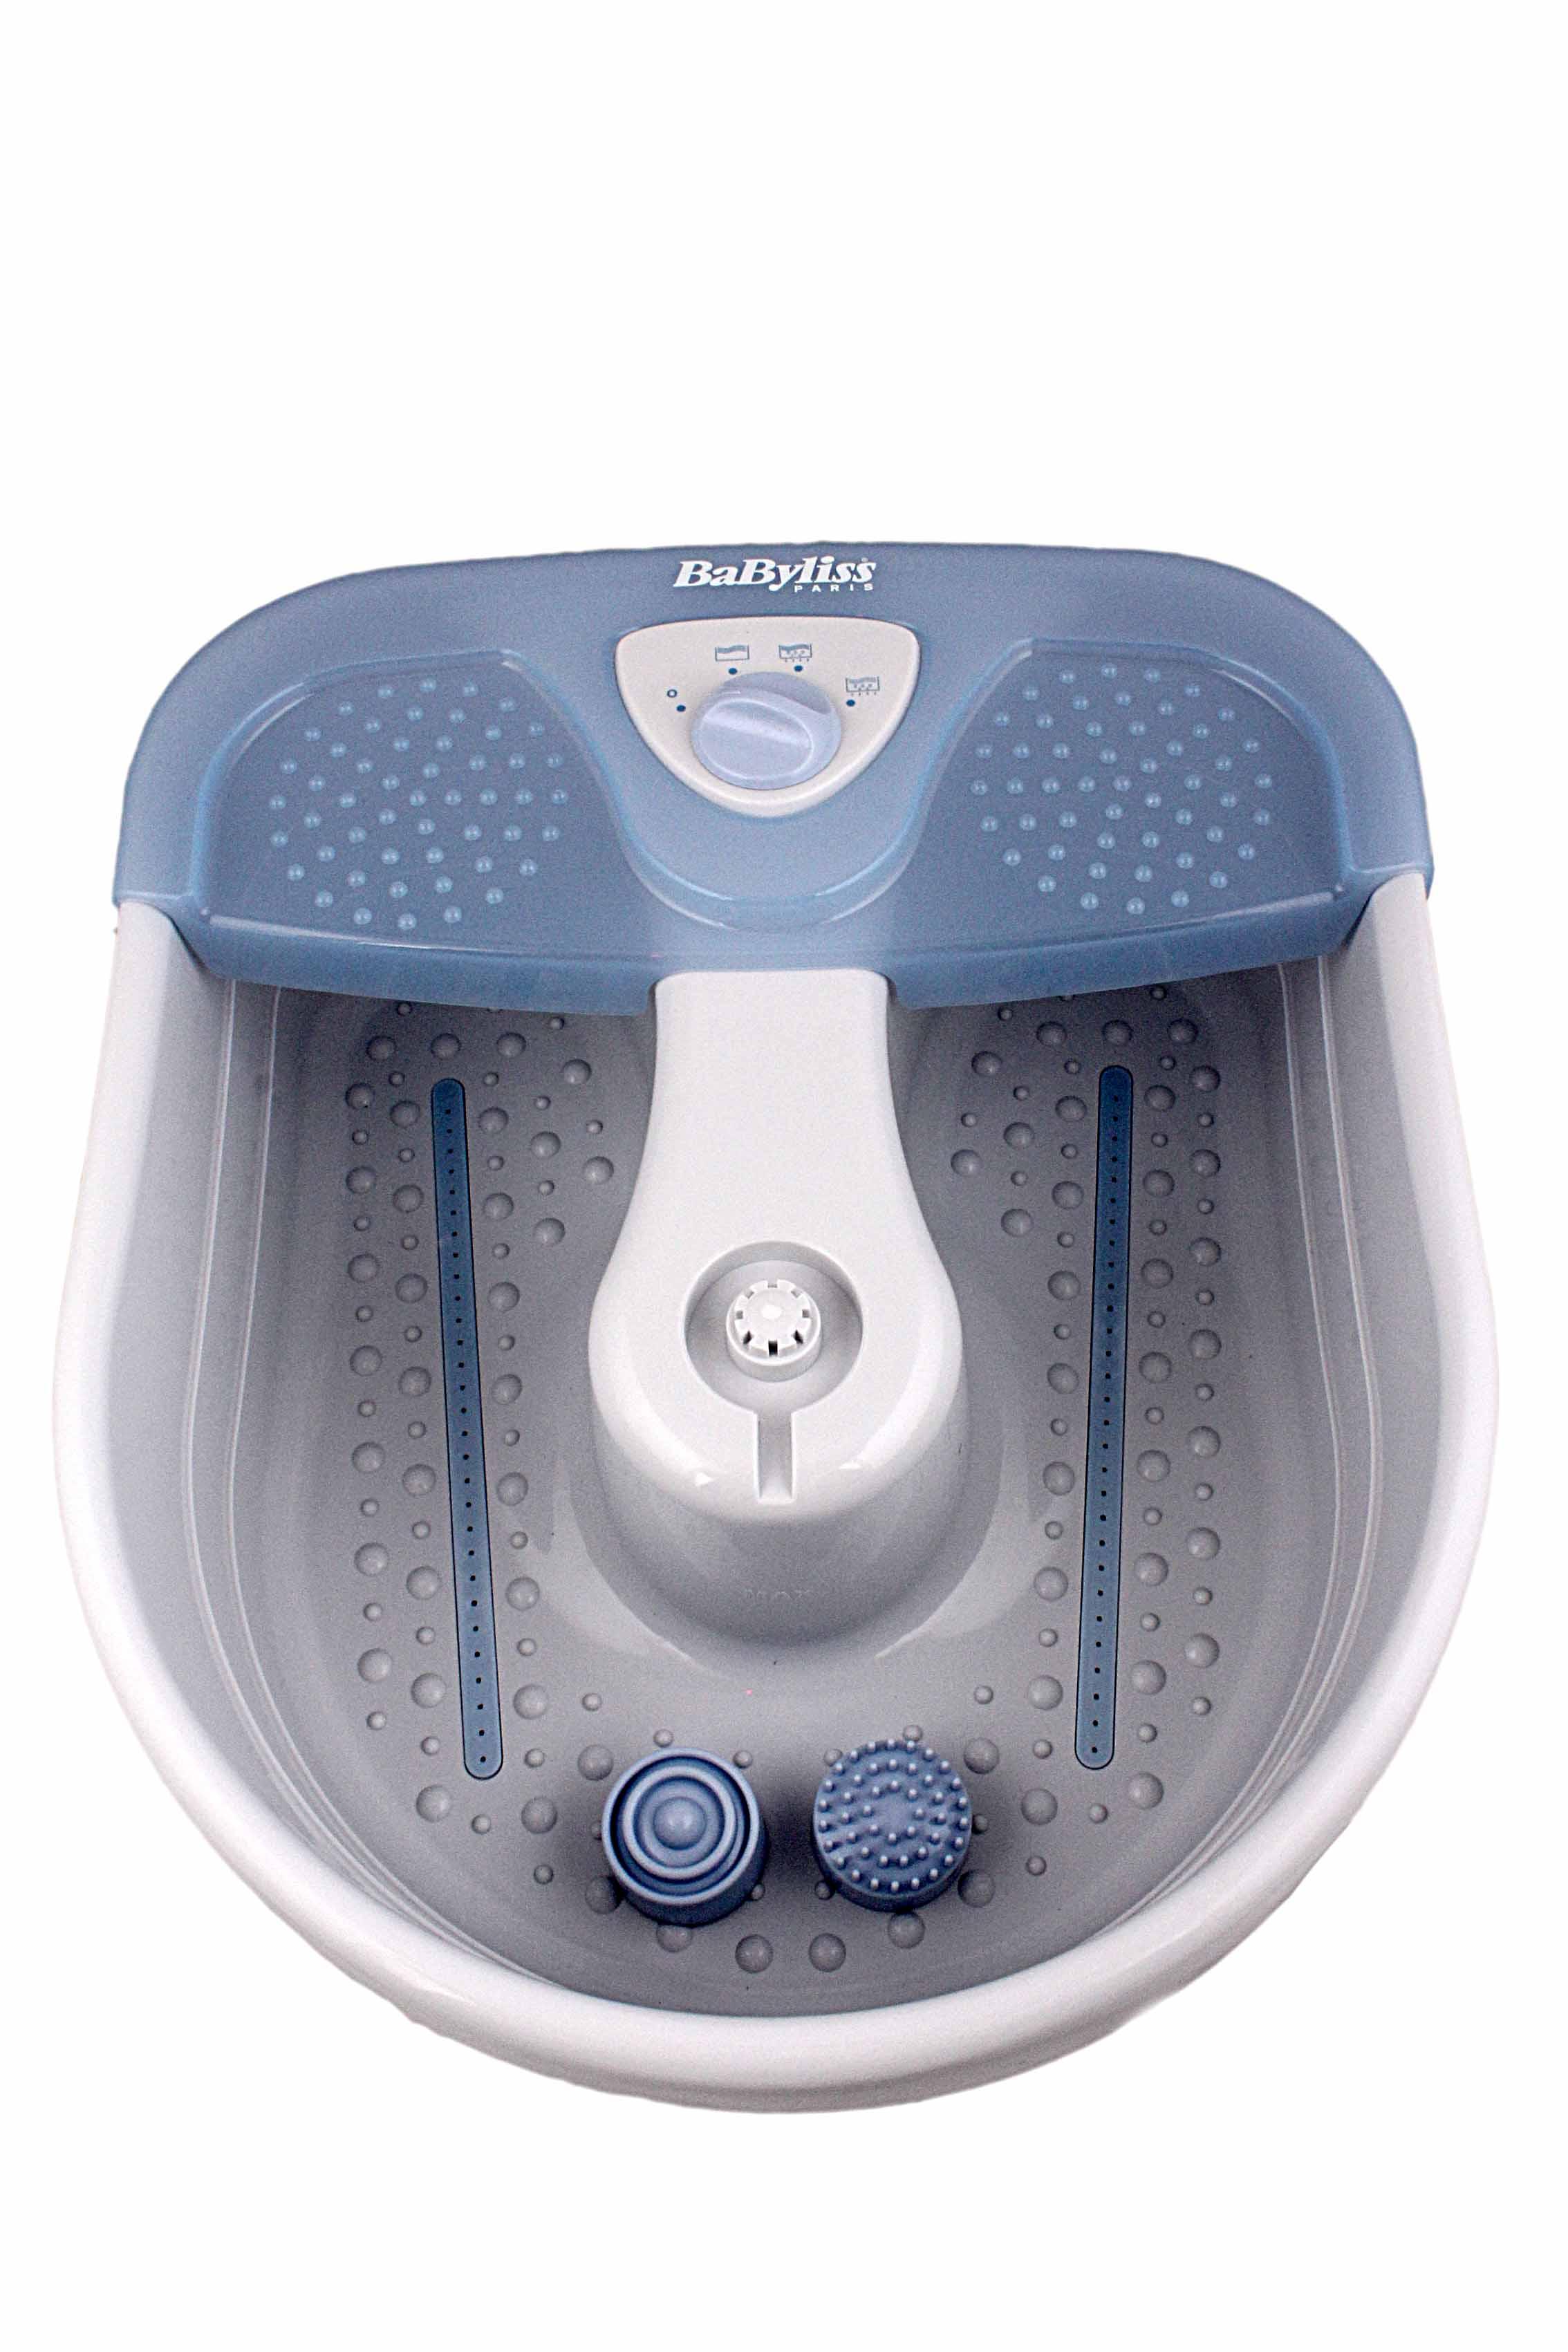 Массажные ванны Babyliss Real Brand Technics 1740.000